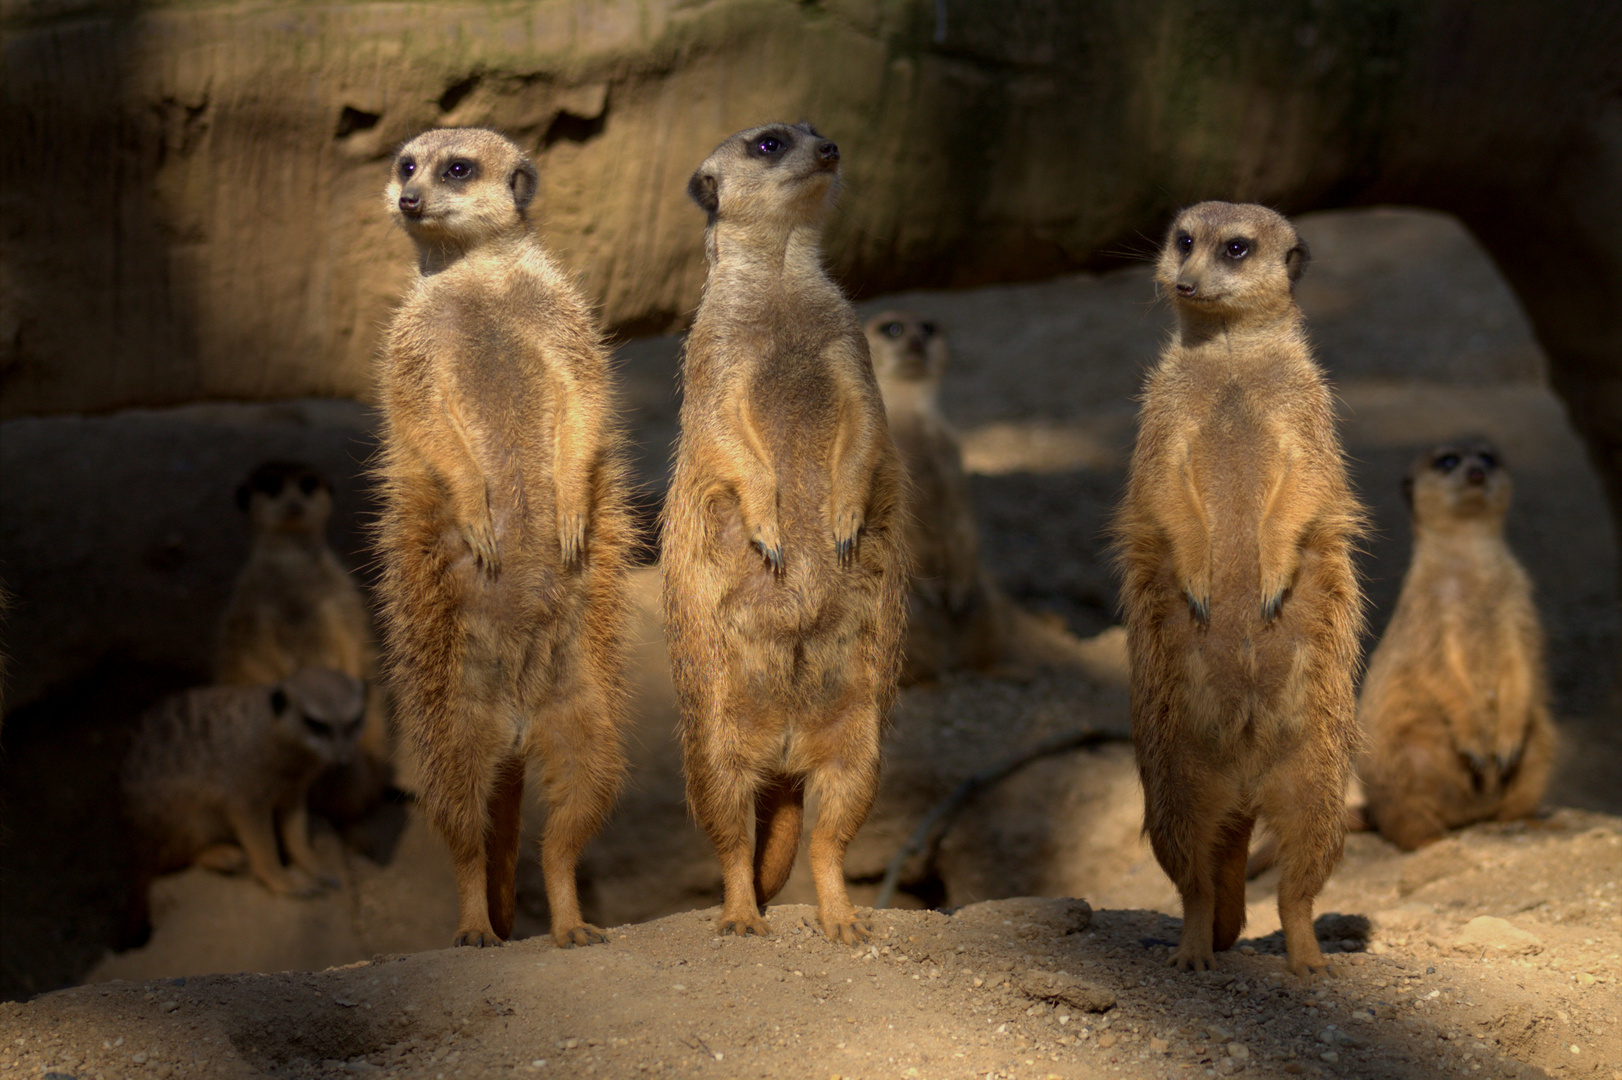 Erdbärmännchen ( in Kindersprache)